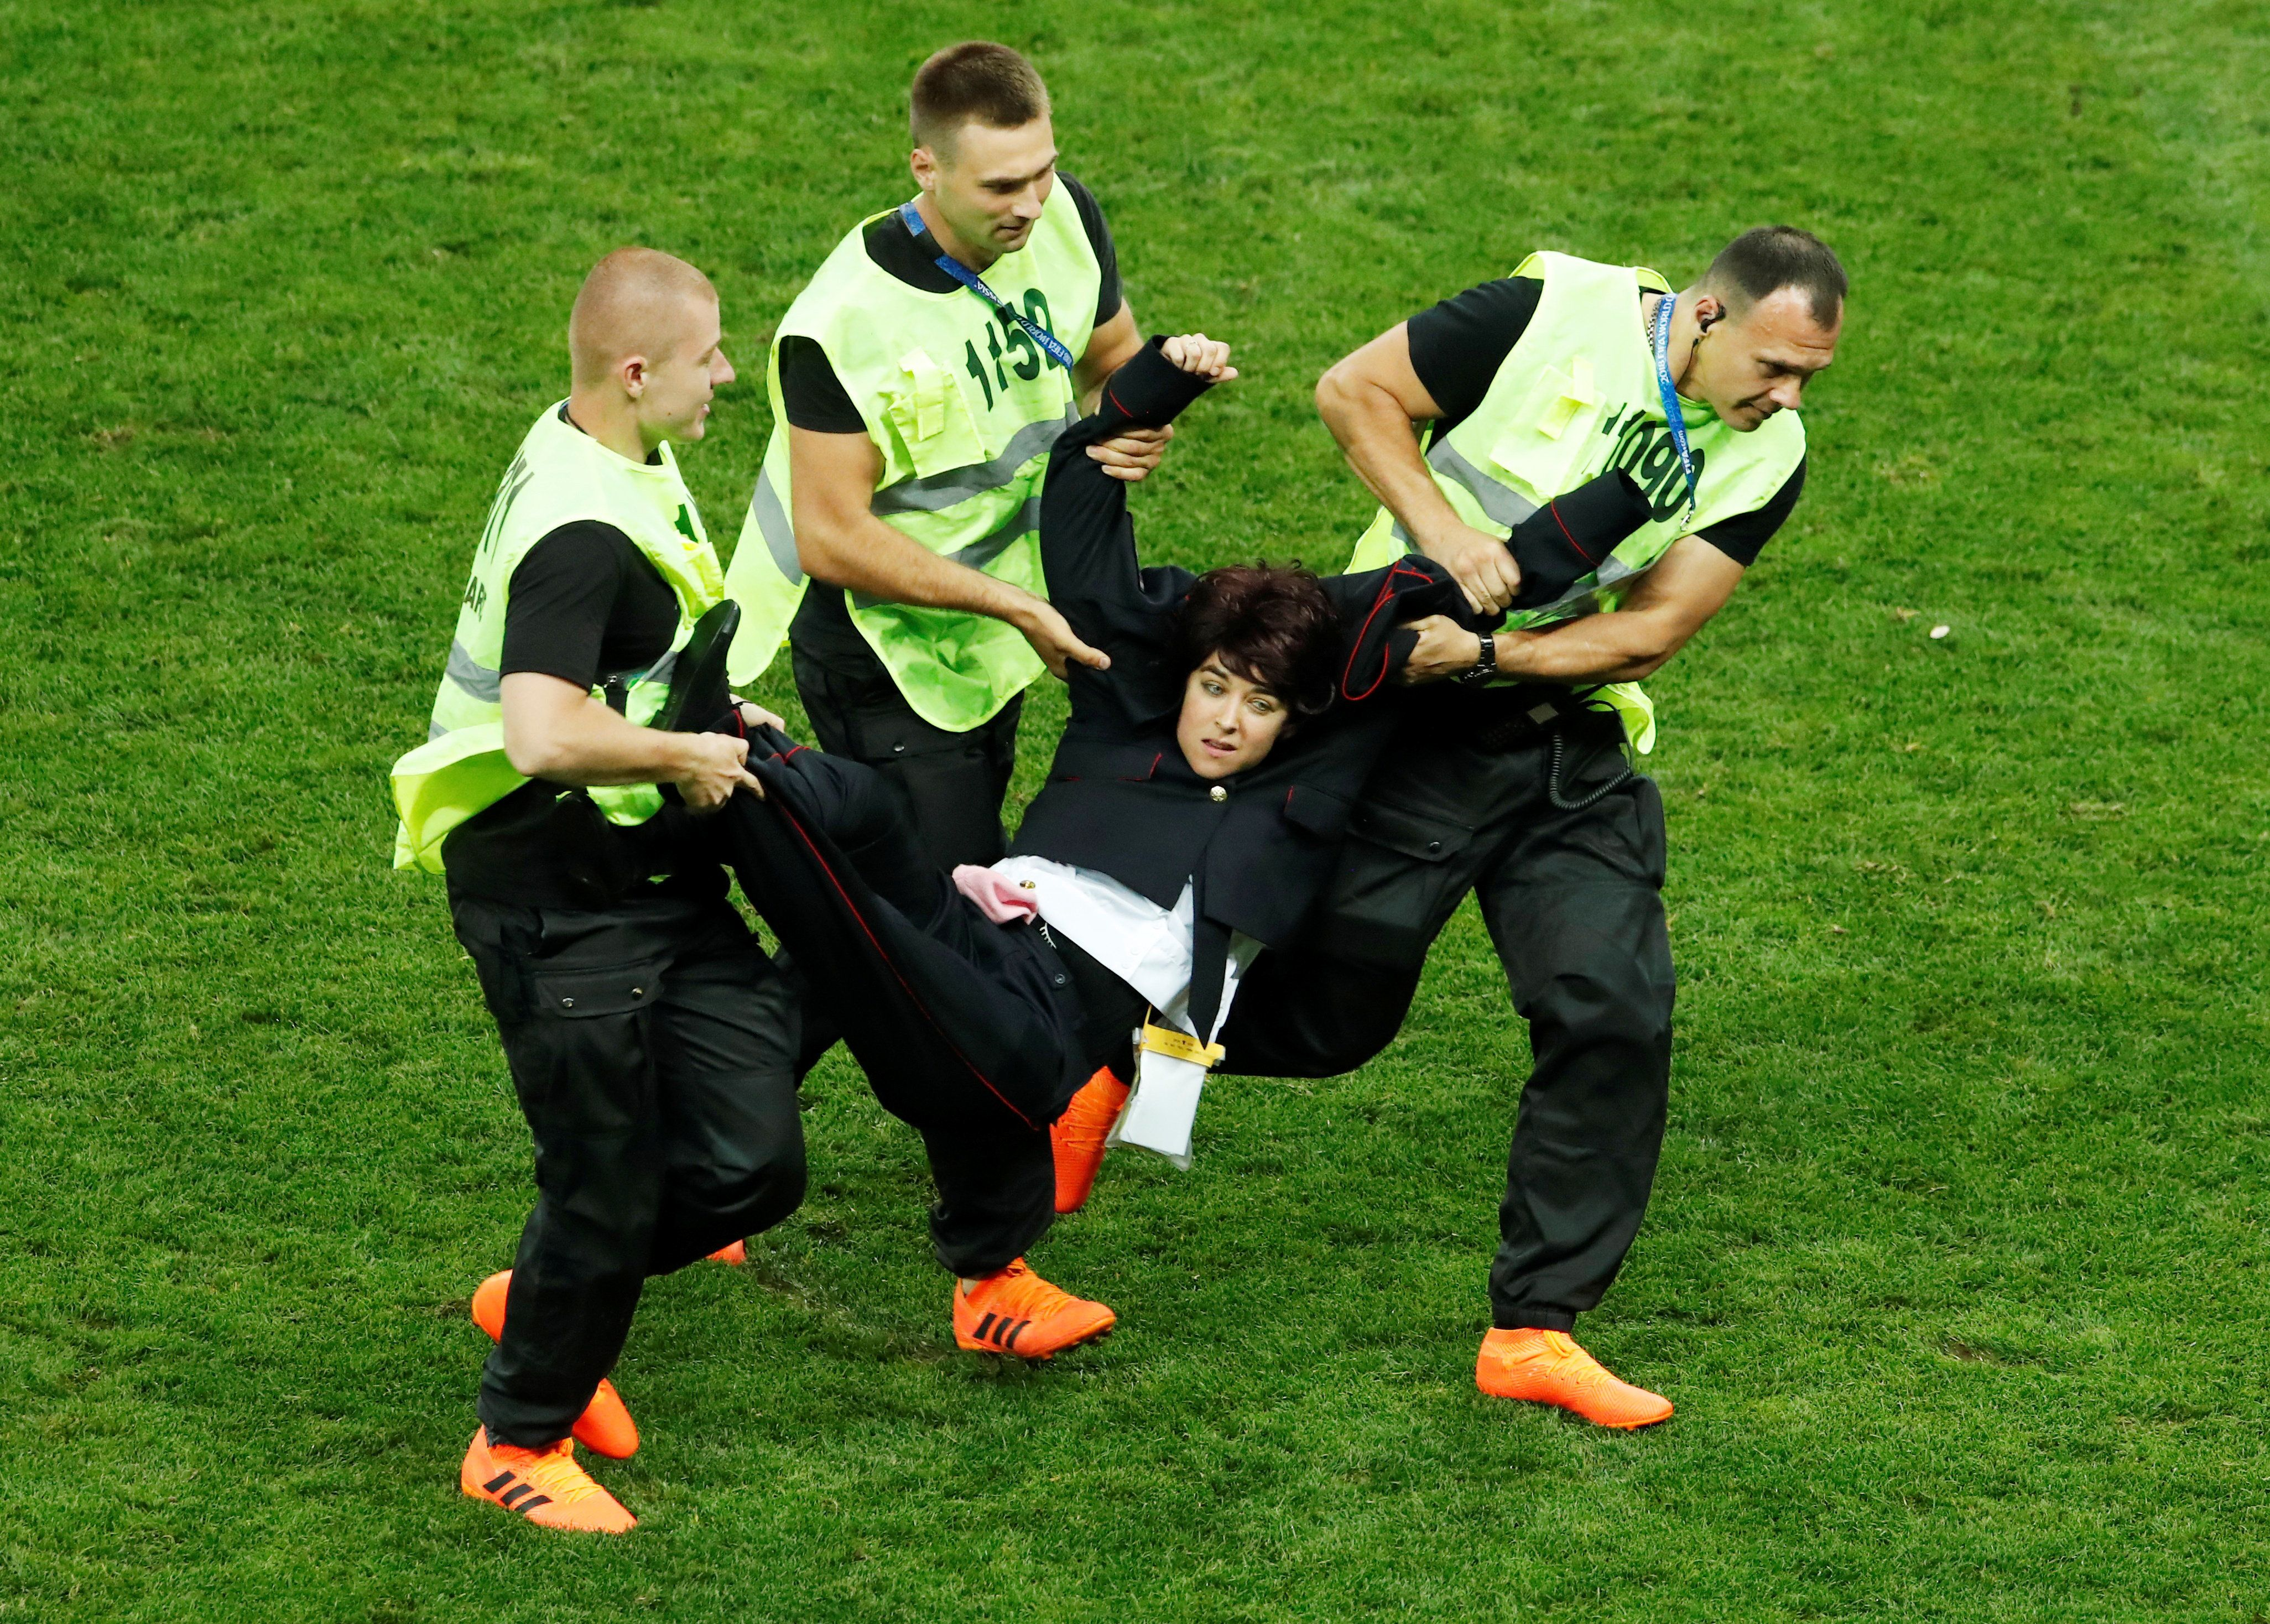 Soccer Football - World Cup - Final - France v Croatia - Luzhniki Stadium, Moscow, Russia - July 15, 2018  Stewards apprehend a pitch invader   REUTERS/Maxim Shemetov